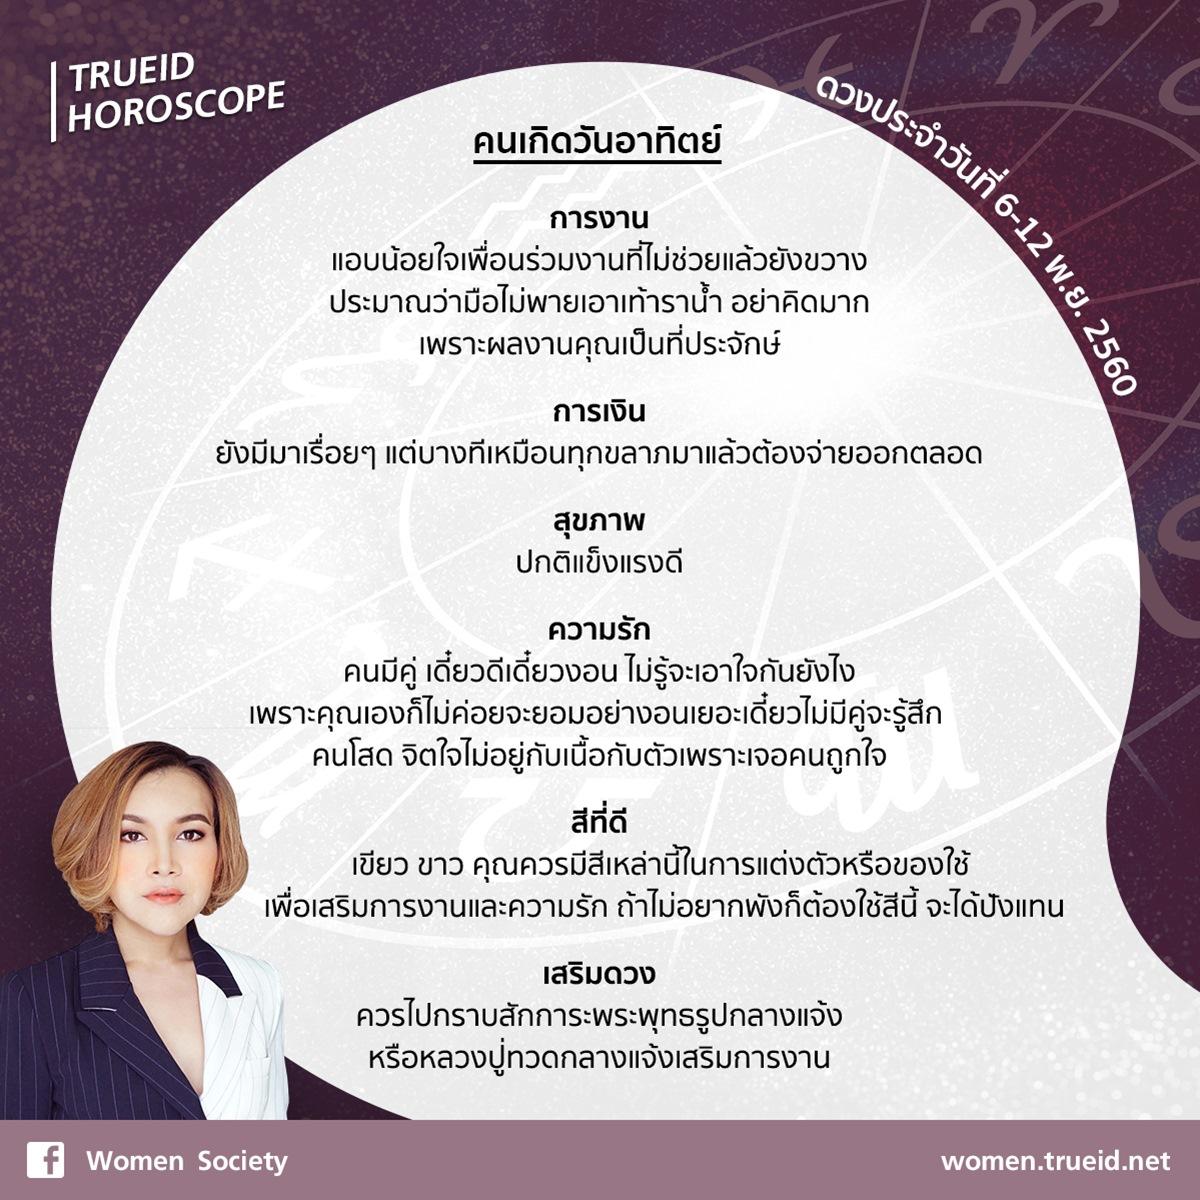 TrueID Horoscope : ดูดวง รายสัปดาห์ แม่นๆ 6-12 พ.ย. 60 โดย หมอดู Toktak A4